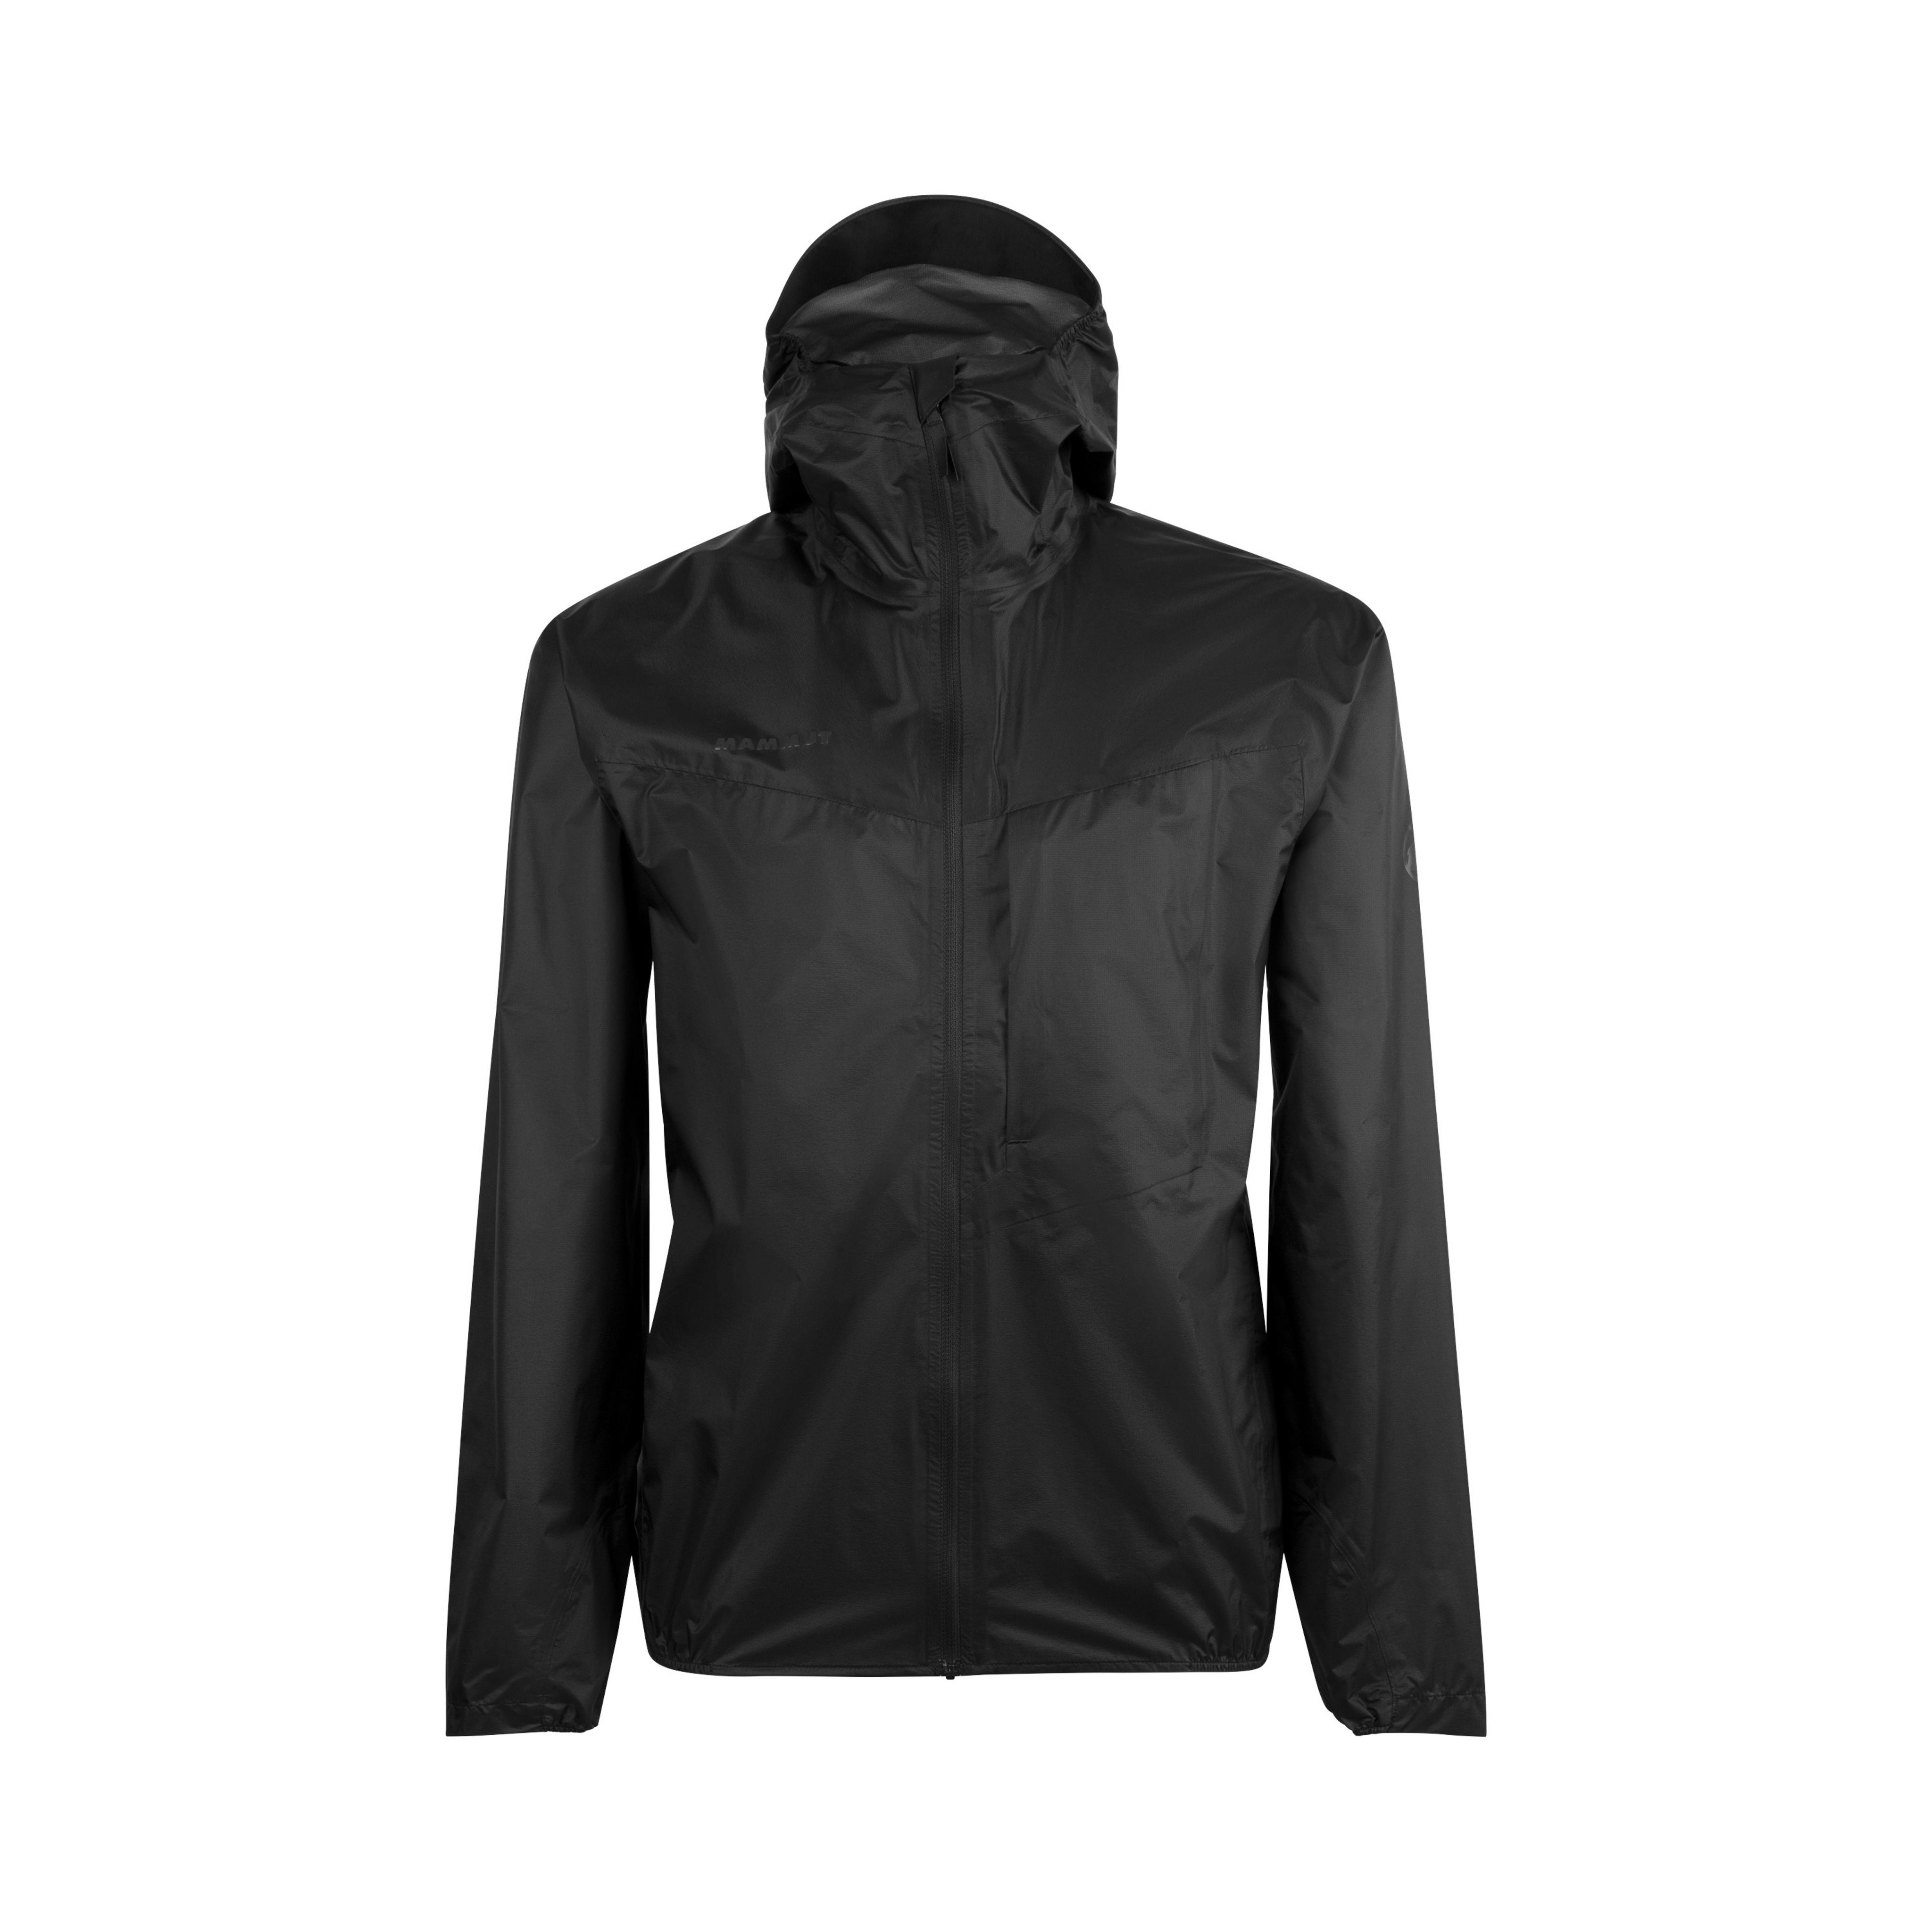 Kento Light HS Hooded Jacket Men - black, S thumbnail